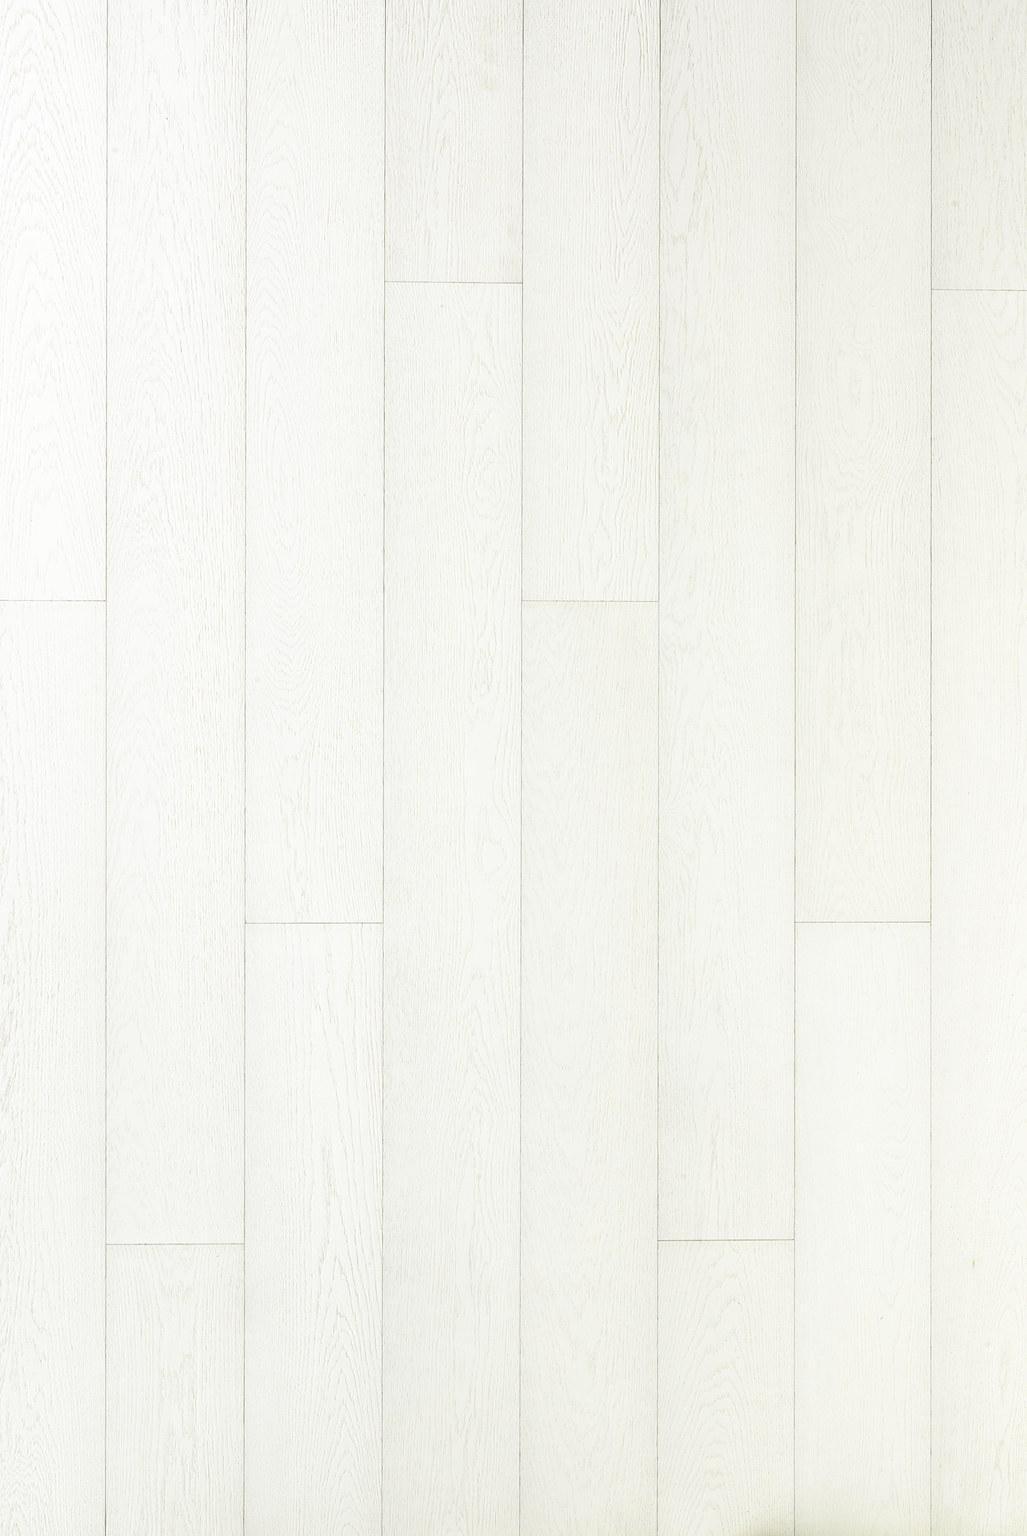 Timberwise Parketti Lankkuparketti Puulattia Wooden Floor Parquet Plank Tammi Oak Polar 2D1